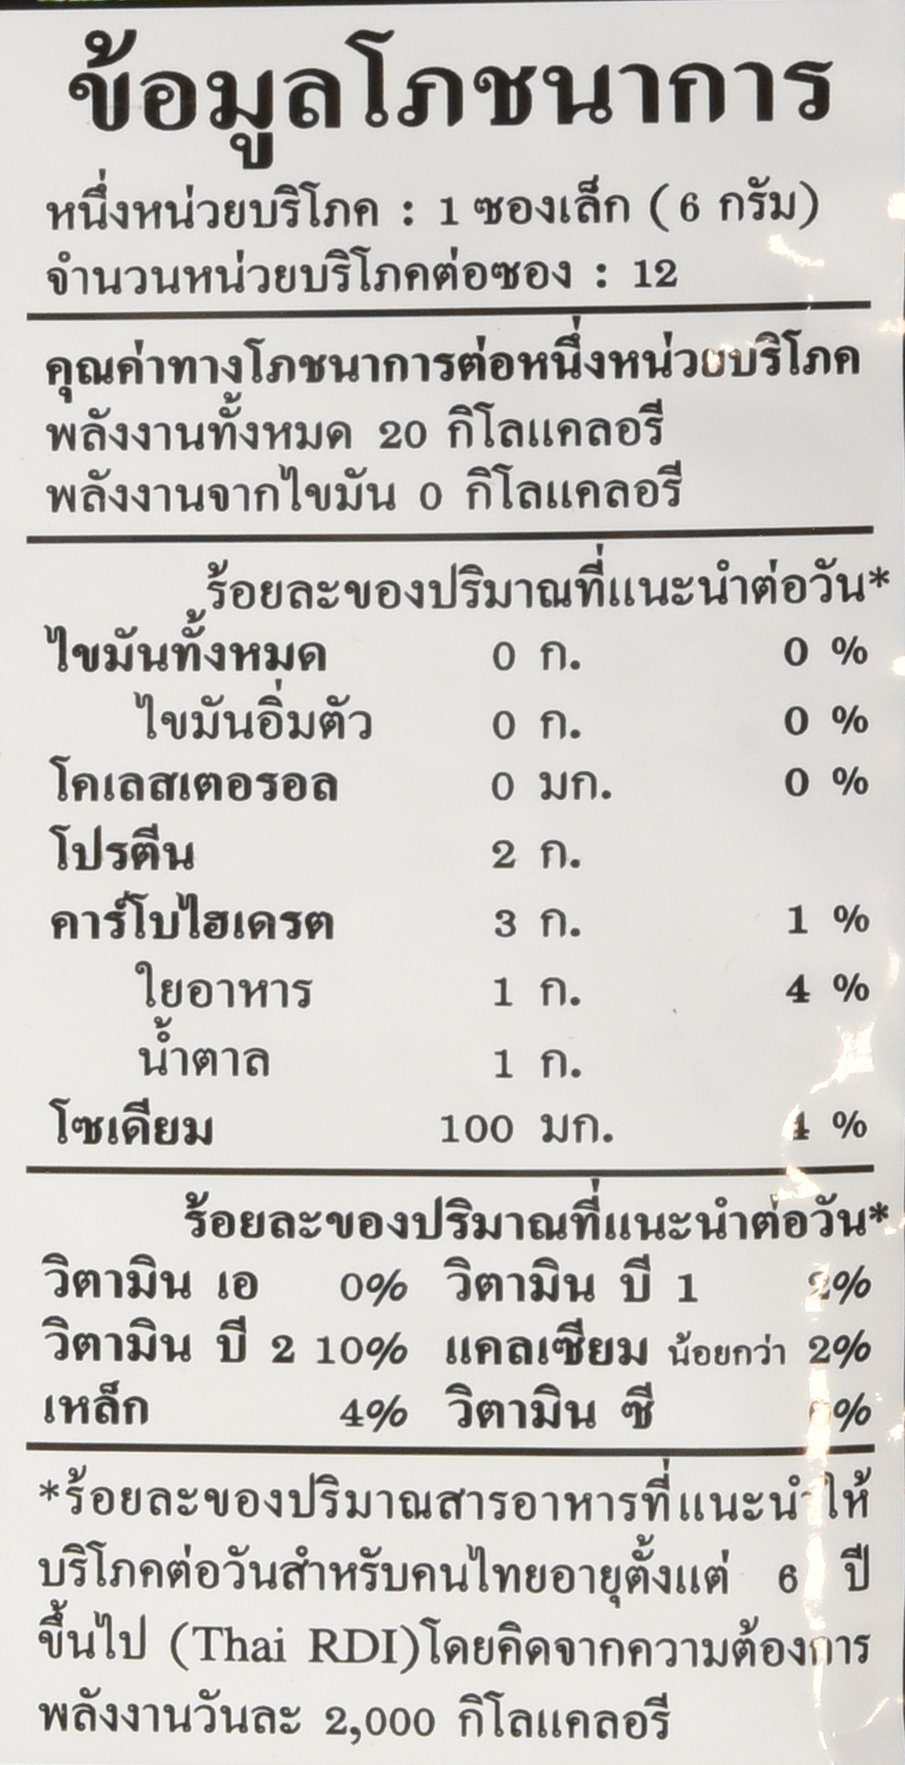 Taokaenoi Seaweed Snacks Most Famous Thai Nori Grilled Crispy Seaweed Sheets Tom Yum Spicy Shrimp Flavour, Big Bag, Value Pack (72g) 12 Sheets